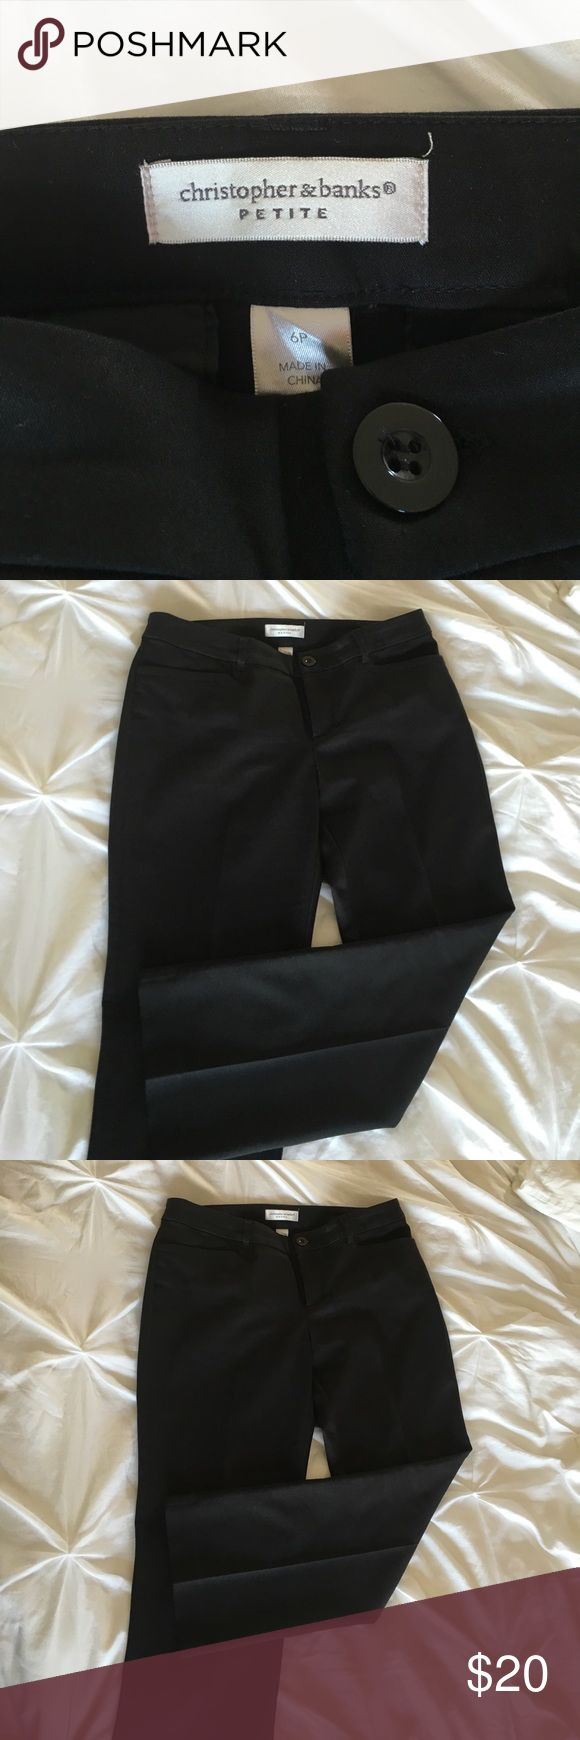 "Size 6 petite black dress pants Size 6P, black Christopher Banks dress pants. Waist 16"". Inseam 27"". Excellent condition. Smoke/pet free home. Christopher & Banks Pants"